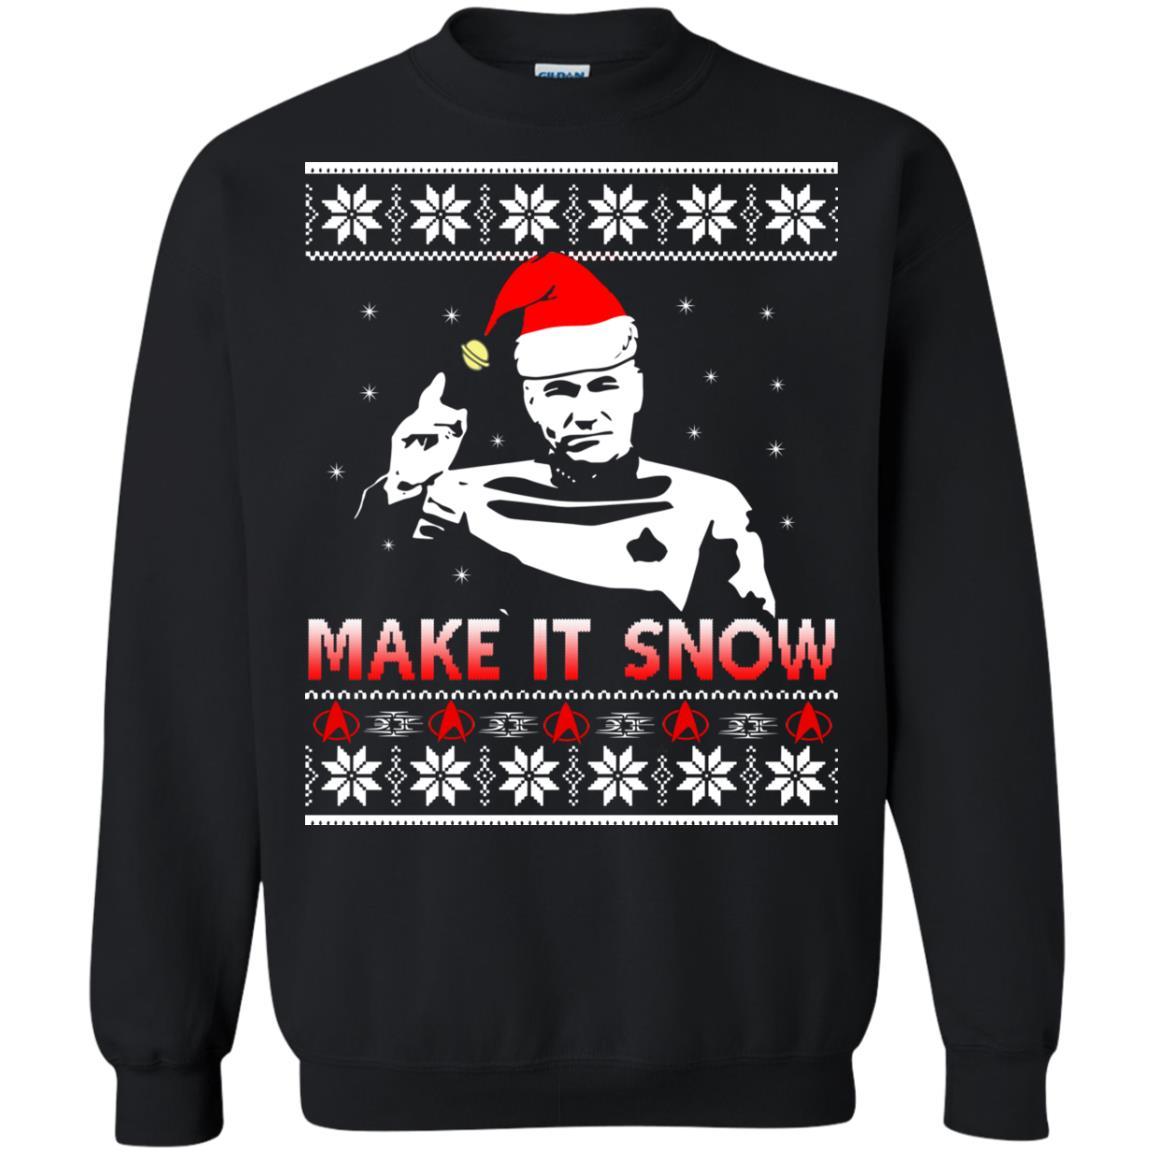 image 2413 - Star Trek make it snow Christmas Sweater, Shirt